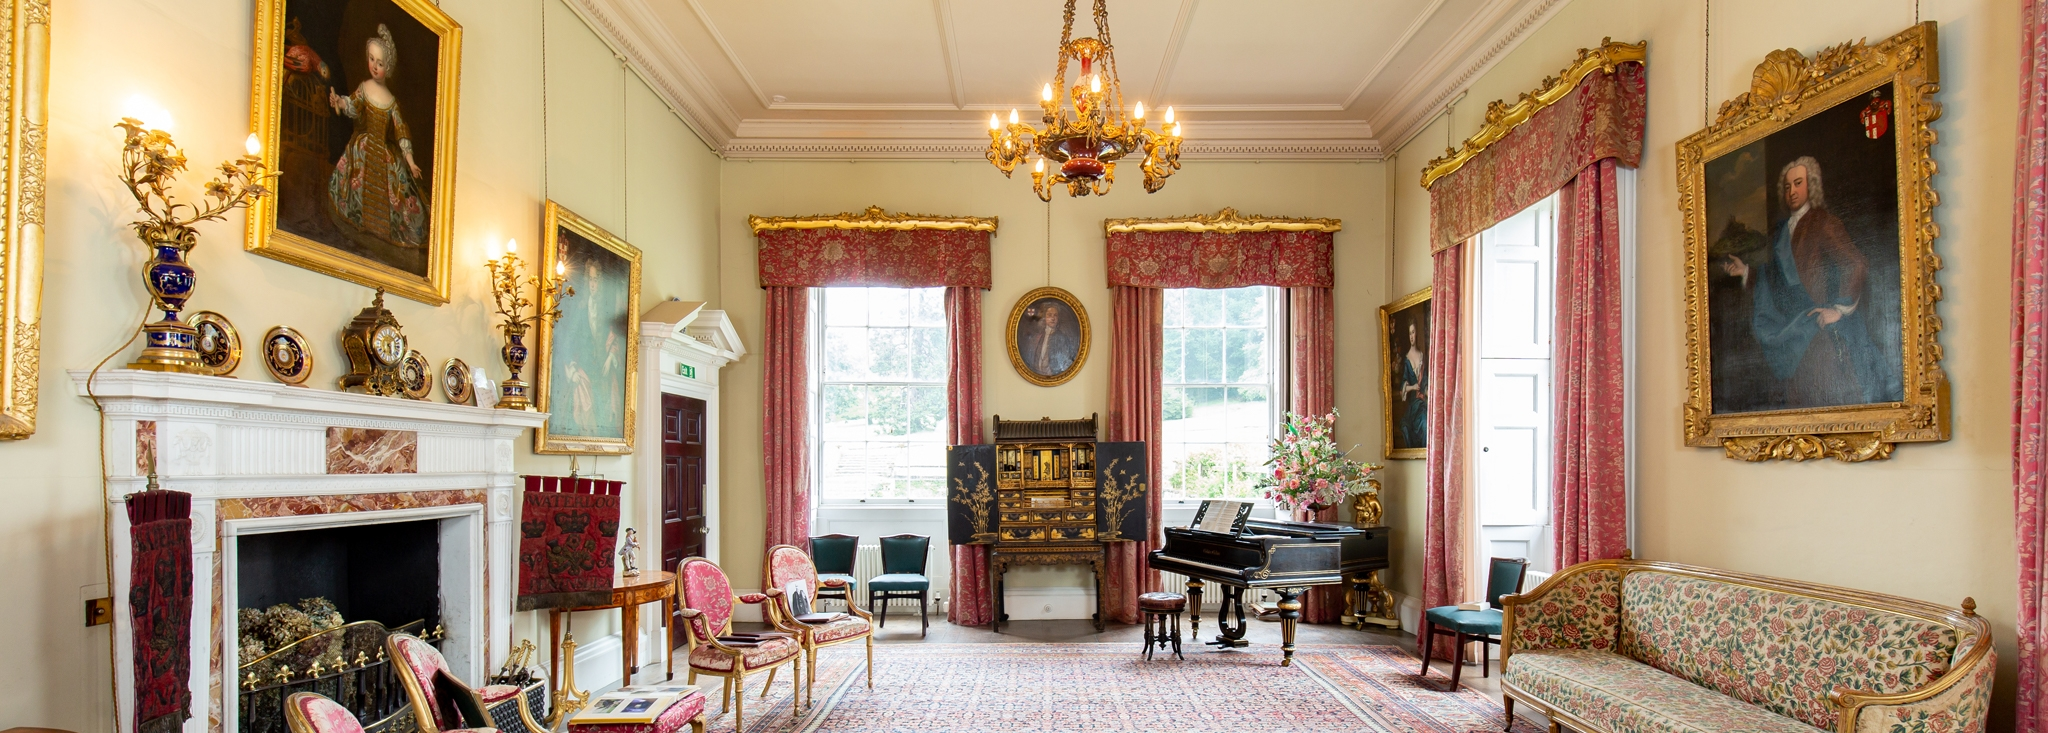 Exquisite interior design at Pencarrow House in-between Wadebridge and Bodmin, Cornwall